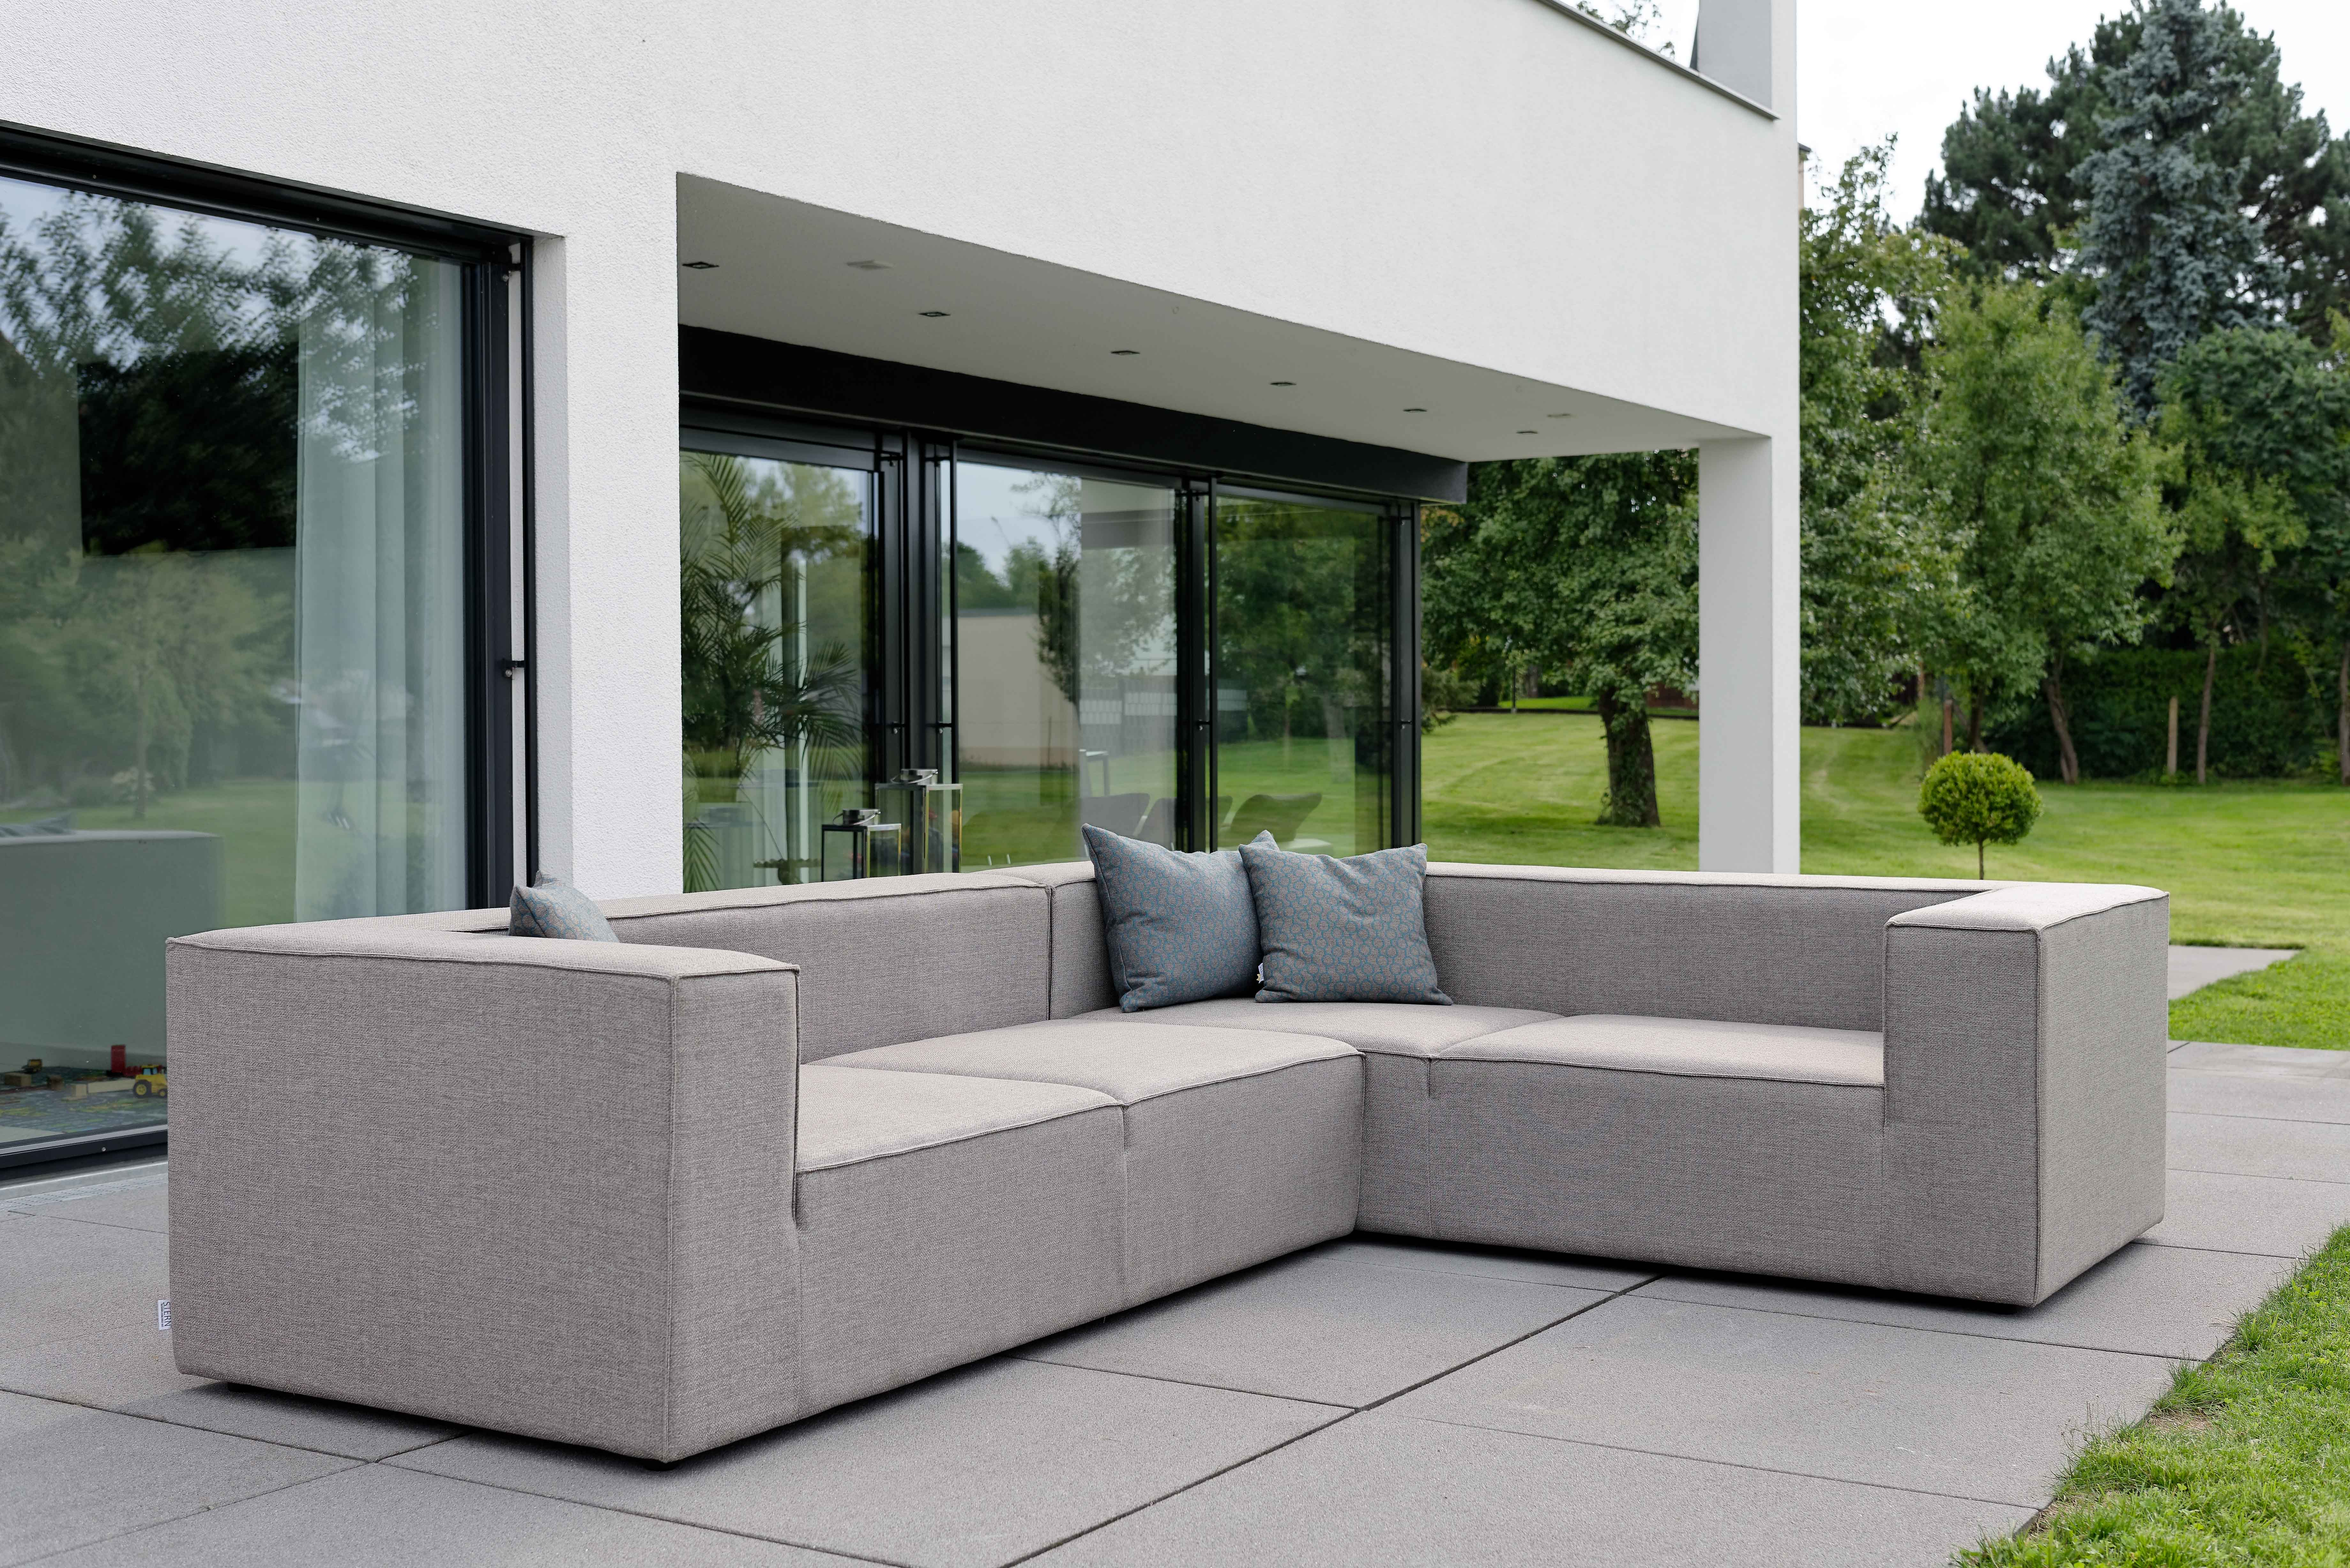 Modern Aluminum Outdoor Sectional Sofa Patio Backyard